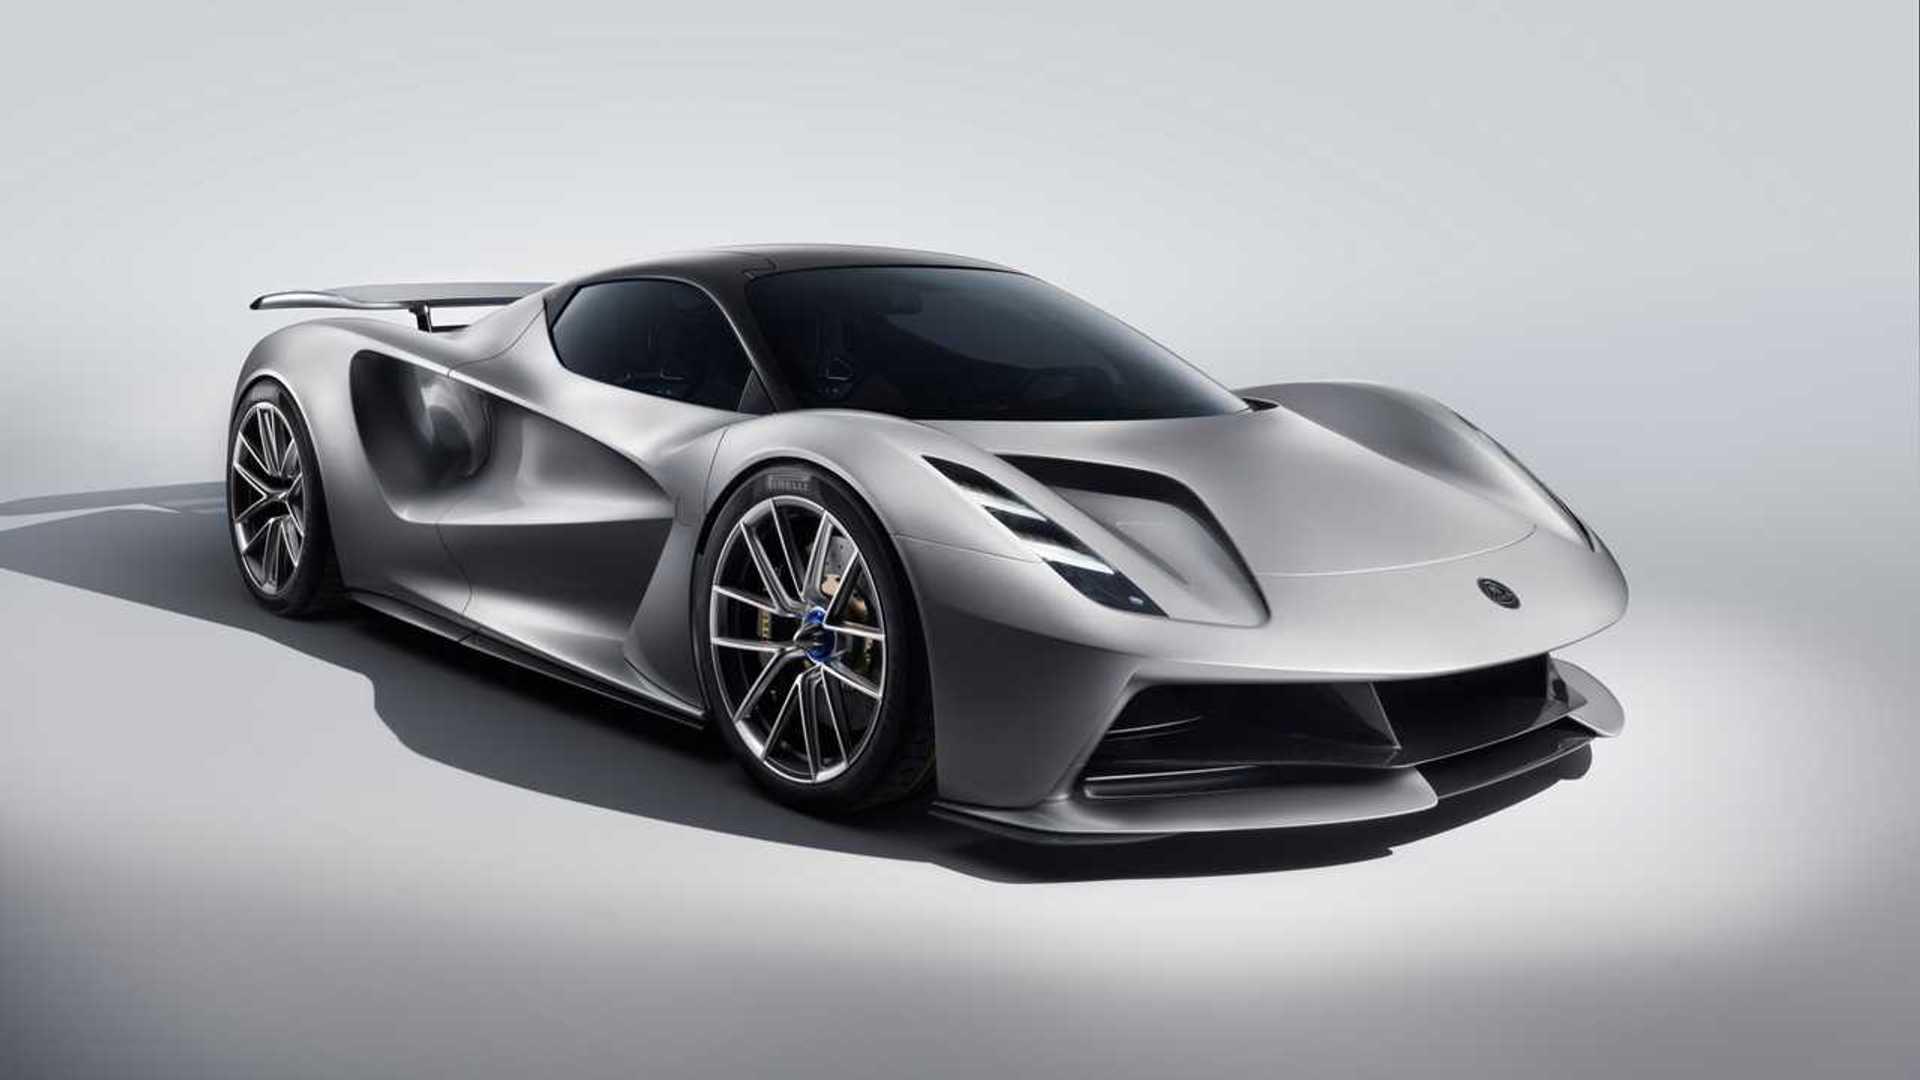 2020 Lotus Evija EV Hypercar Debuts With Nearly 2,000 HP